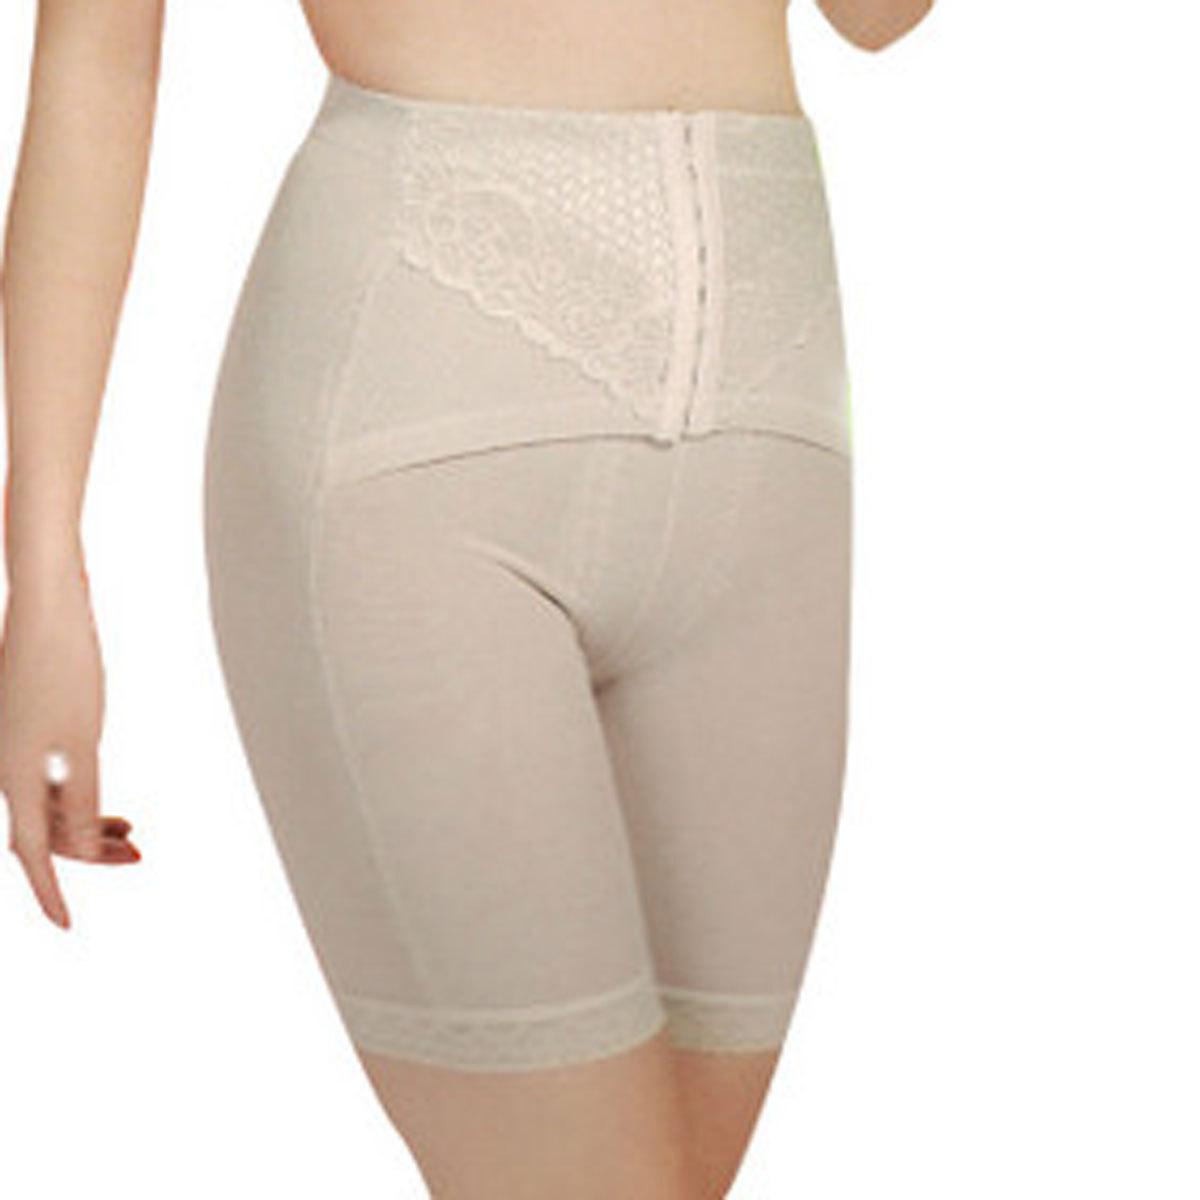 2011 body shaping pants thin abdomen panties drawing butt-lifting abdomen pants drawing abdomen pants